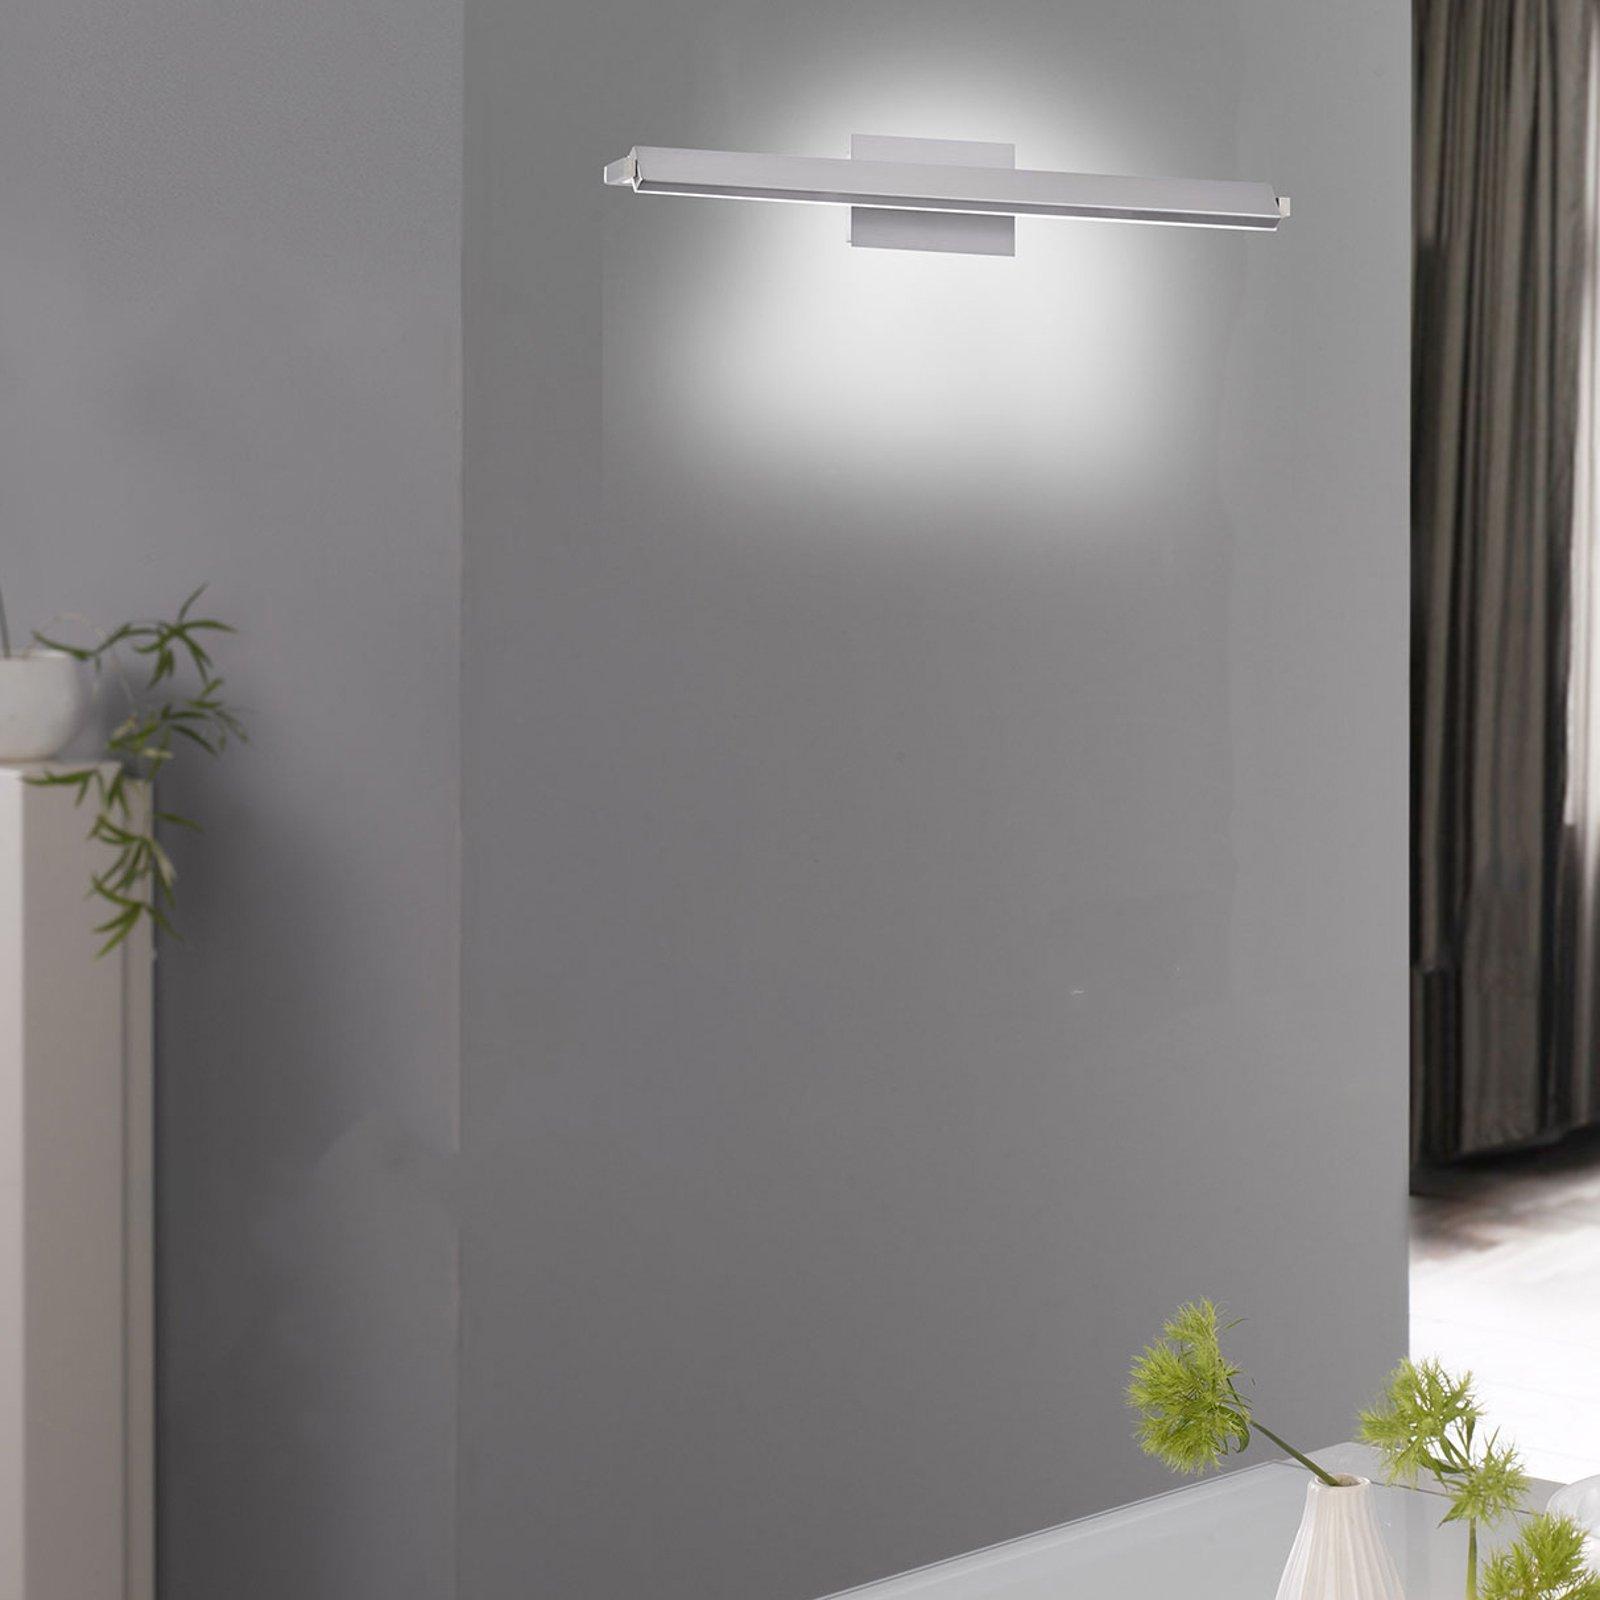 LED-vegglampe Pare TW, dimmer, 3 lysfarger, 60cm